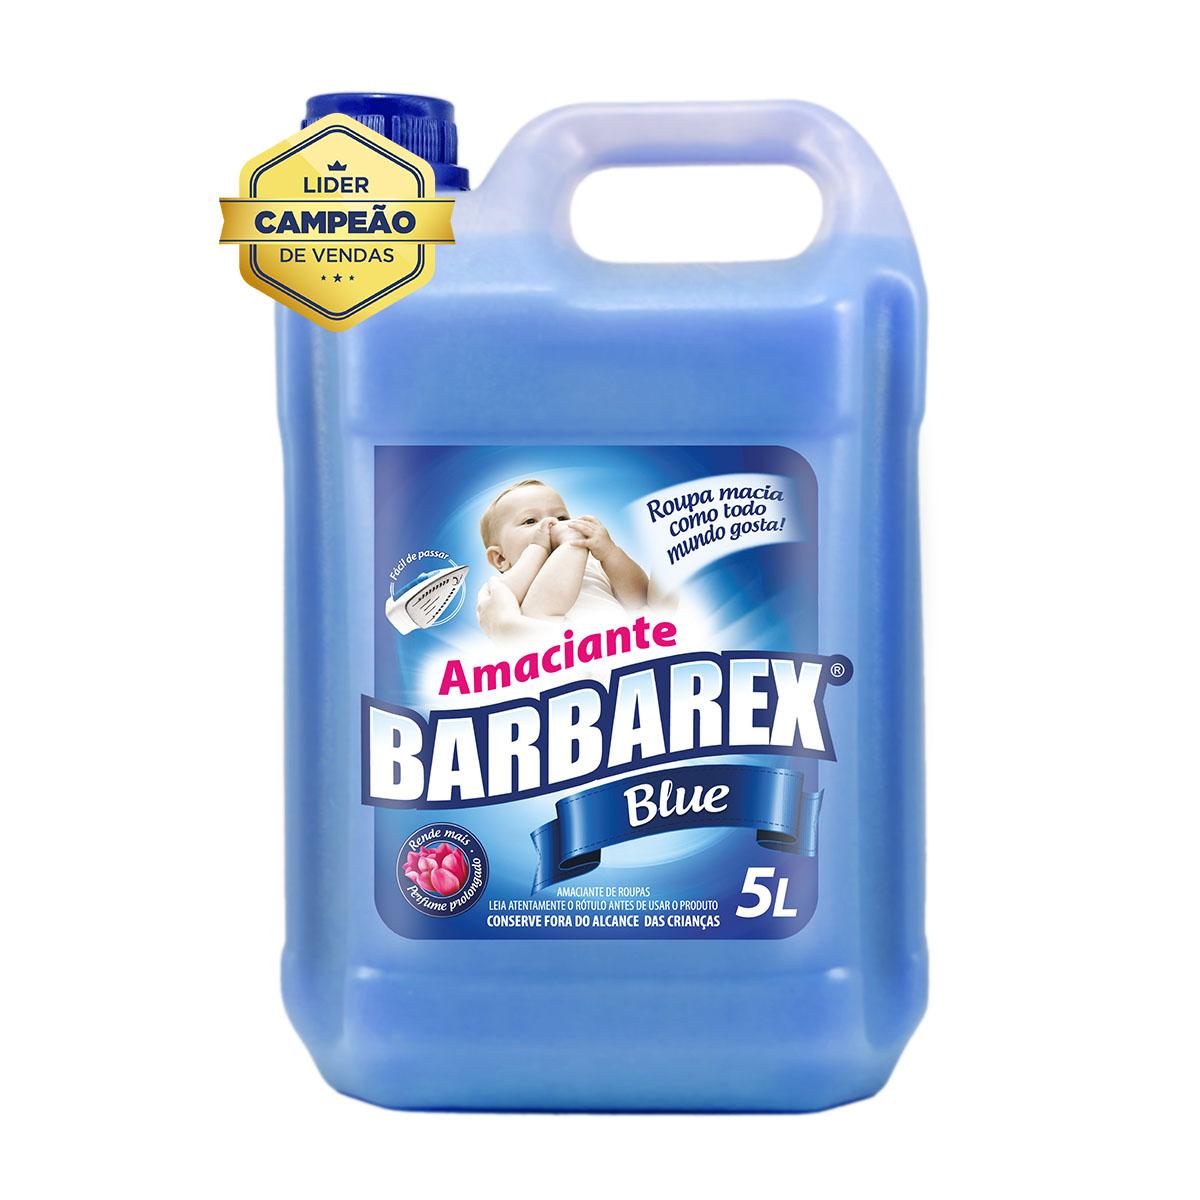 Amaciante de Roupas Blue Barbarex 5 Litros